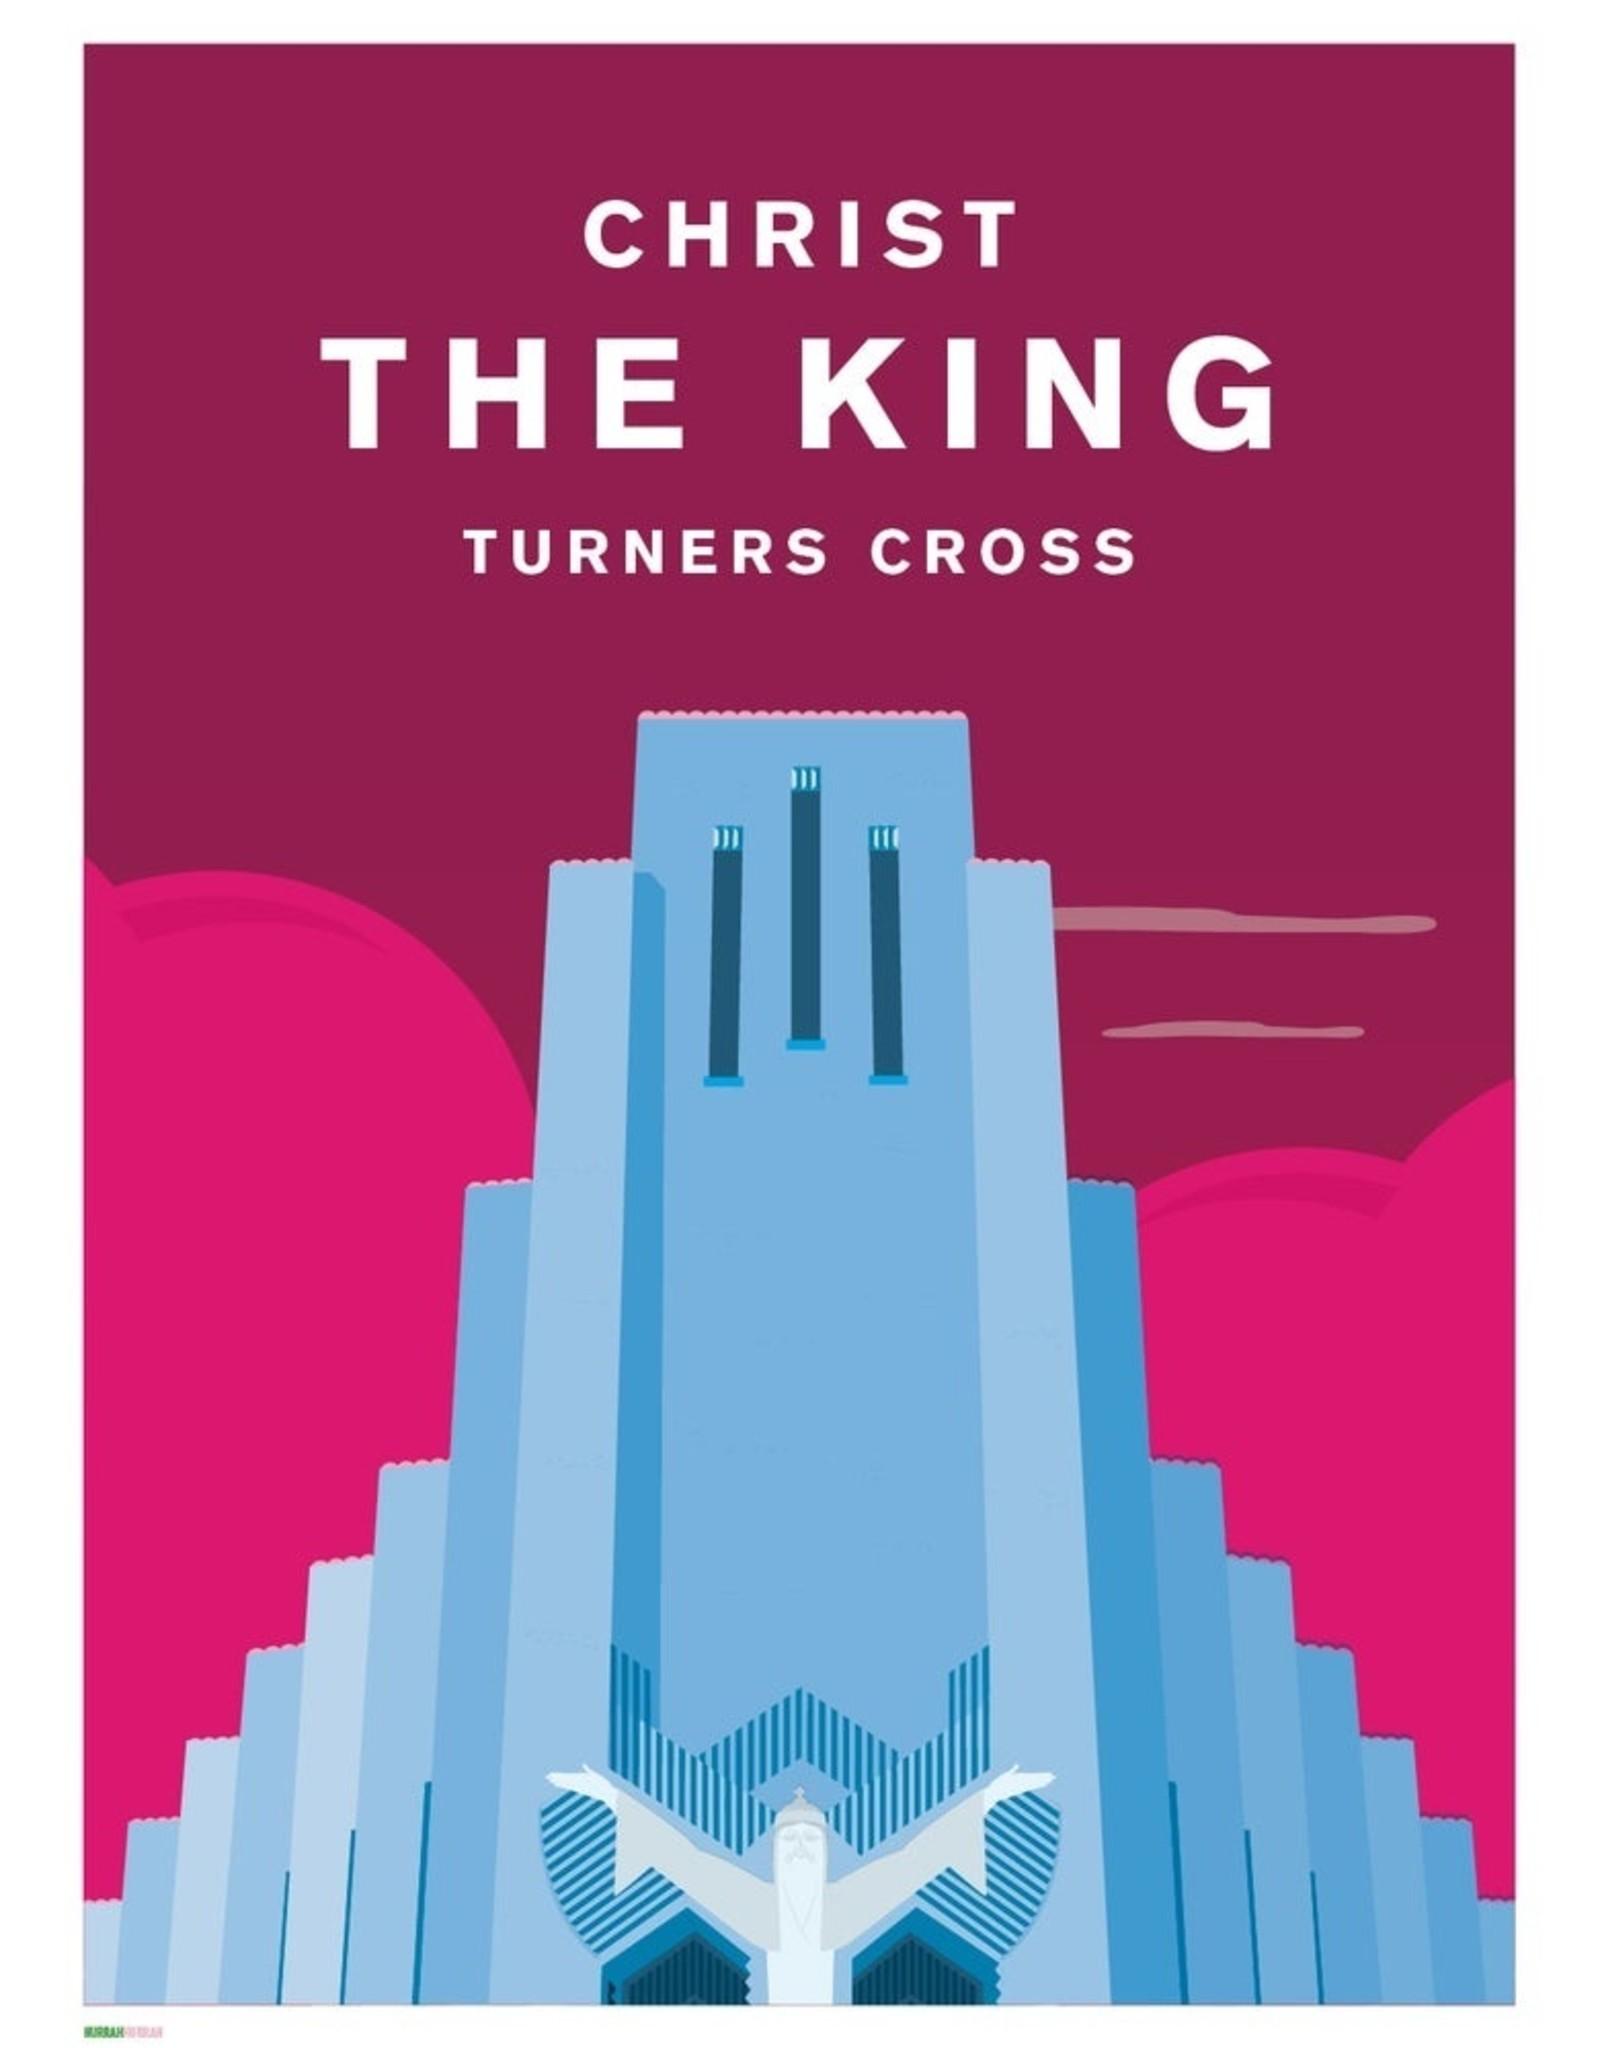 Hurrah Hurrah Hurrah Hurrah Print Christ The King Turners Cross